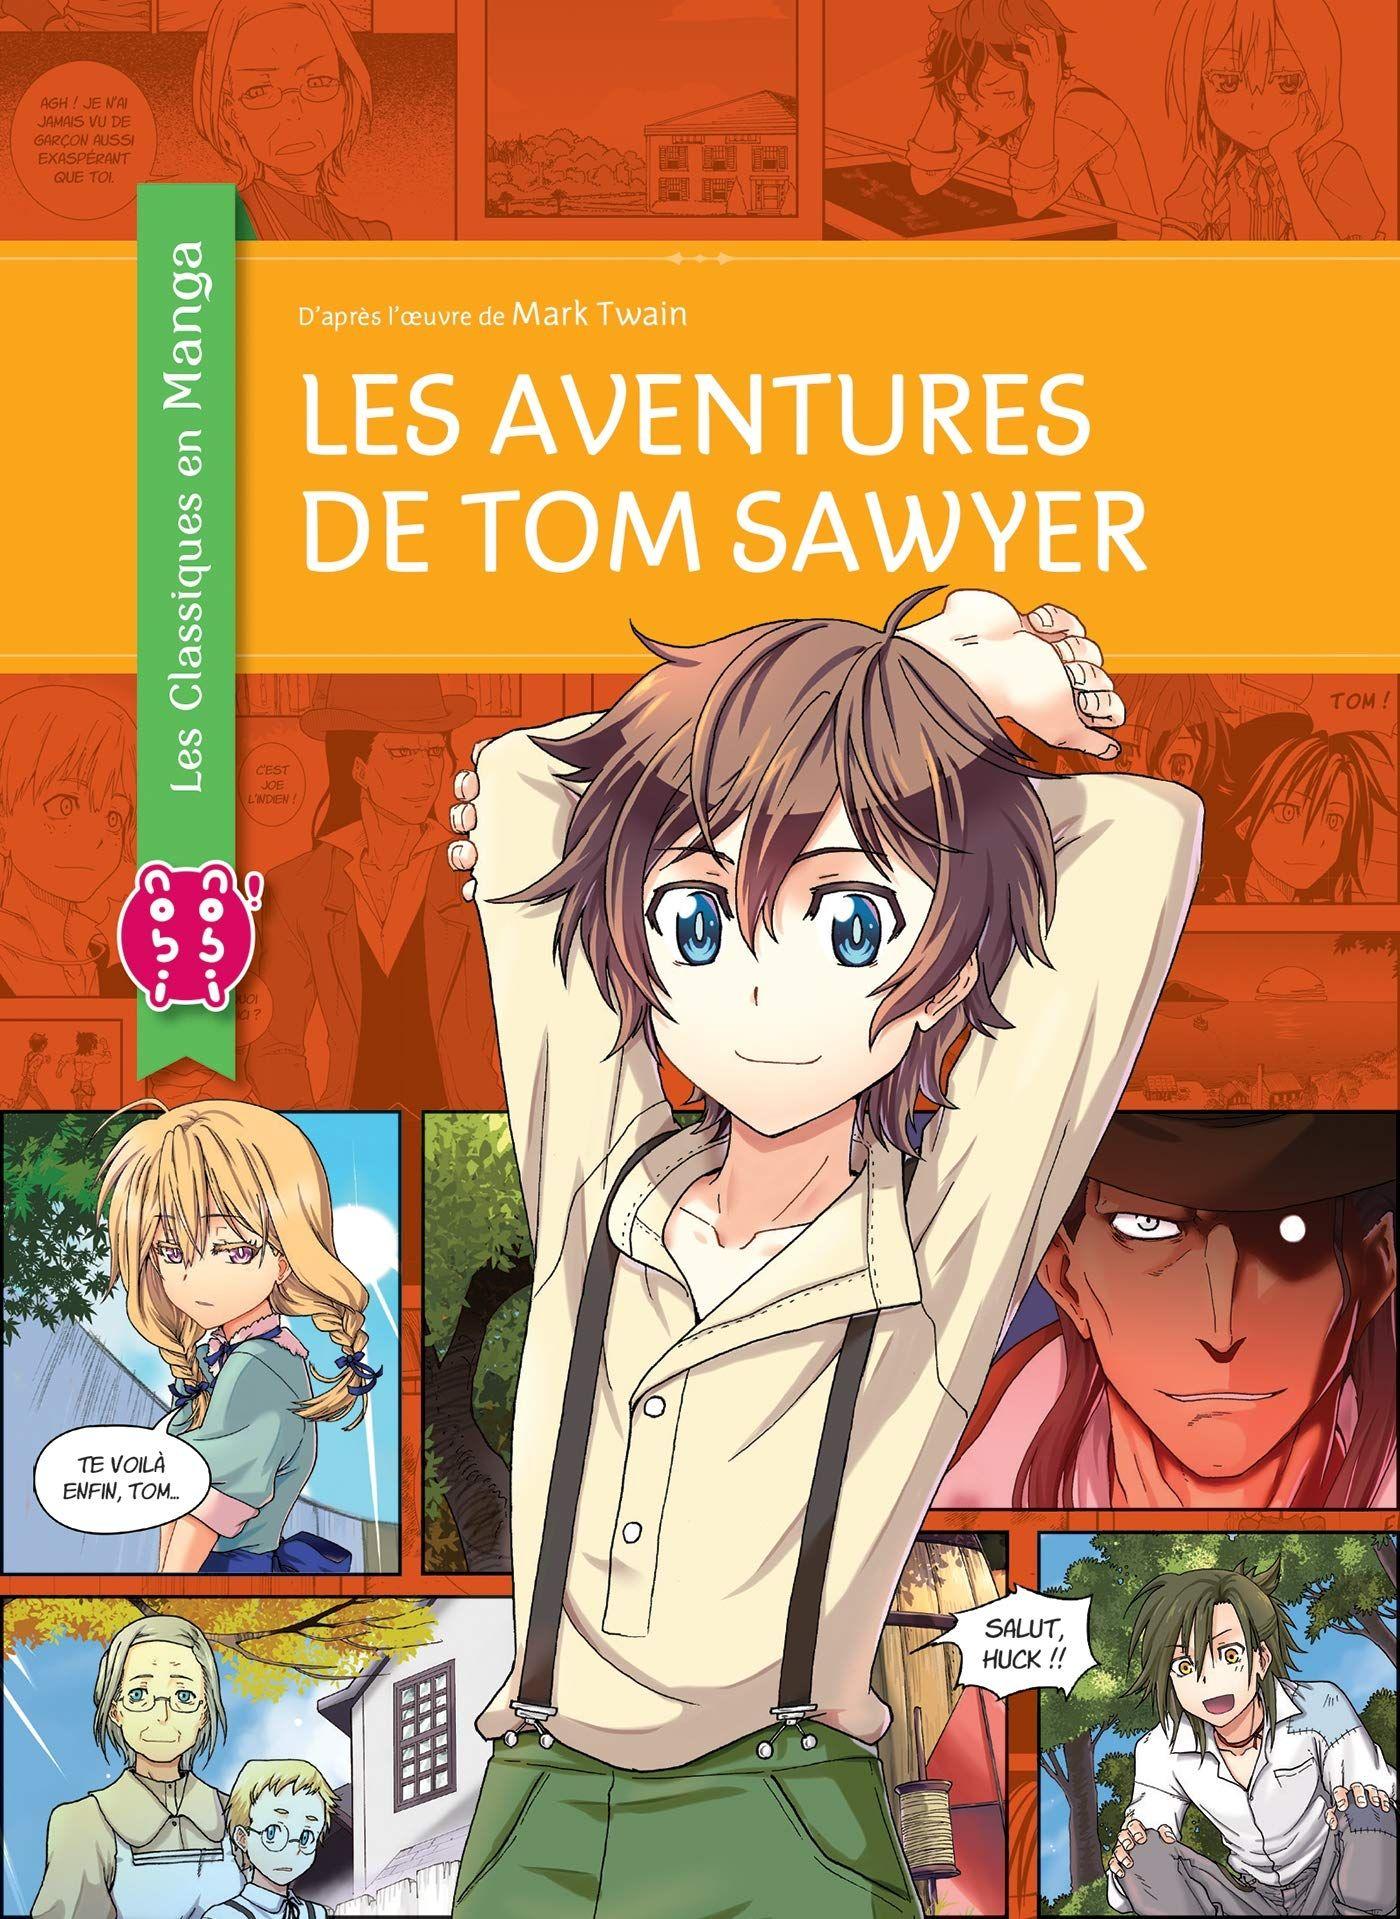 Sortie Manga au Québec JUIN 2021 Aventure-tom-sawyer-nobi-2021